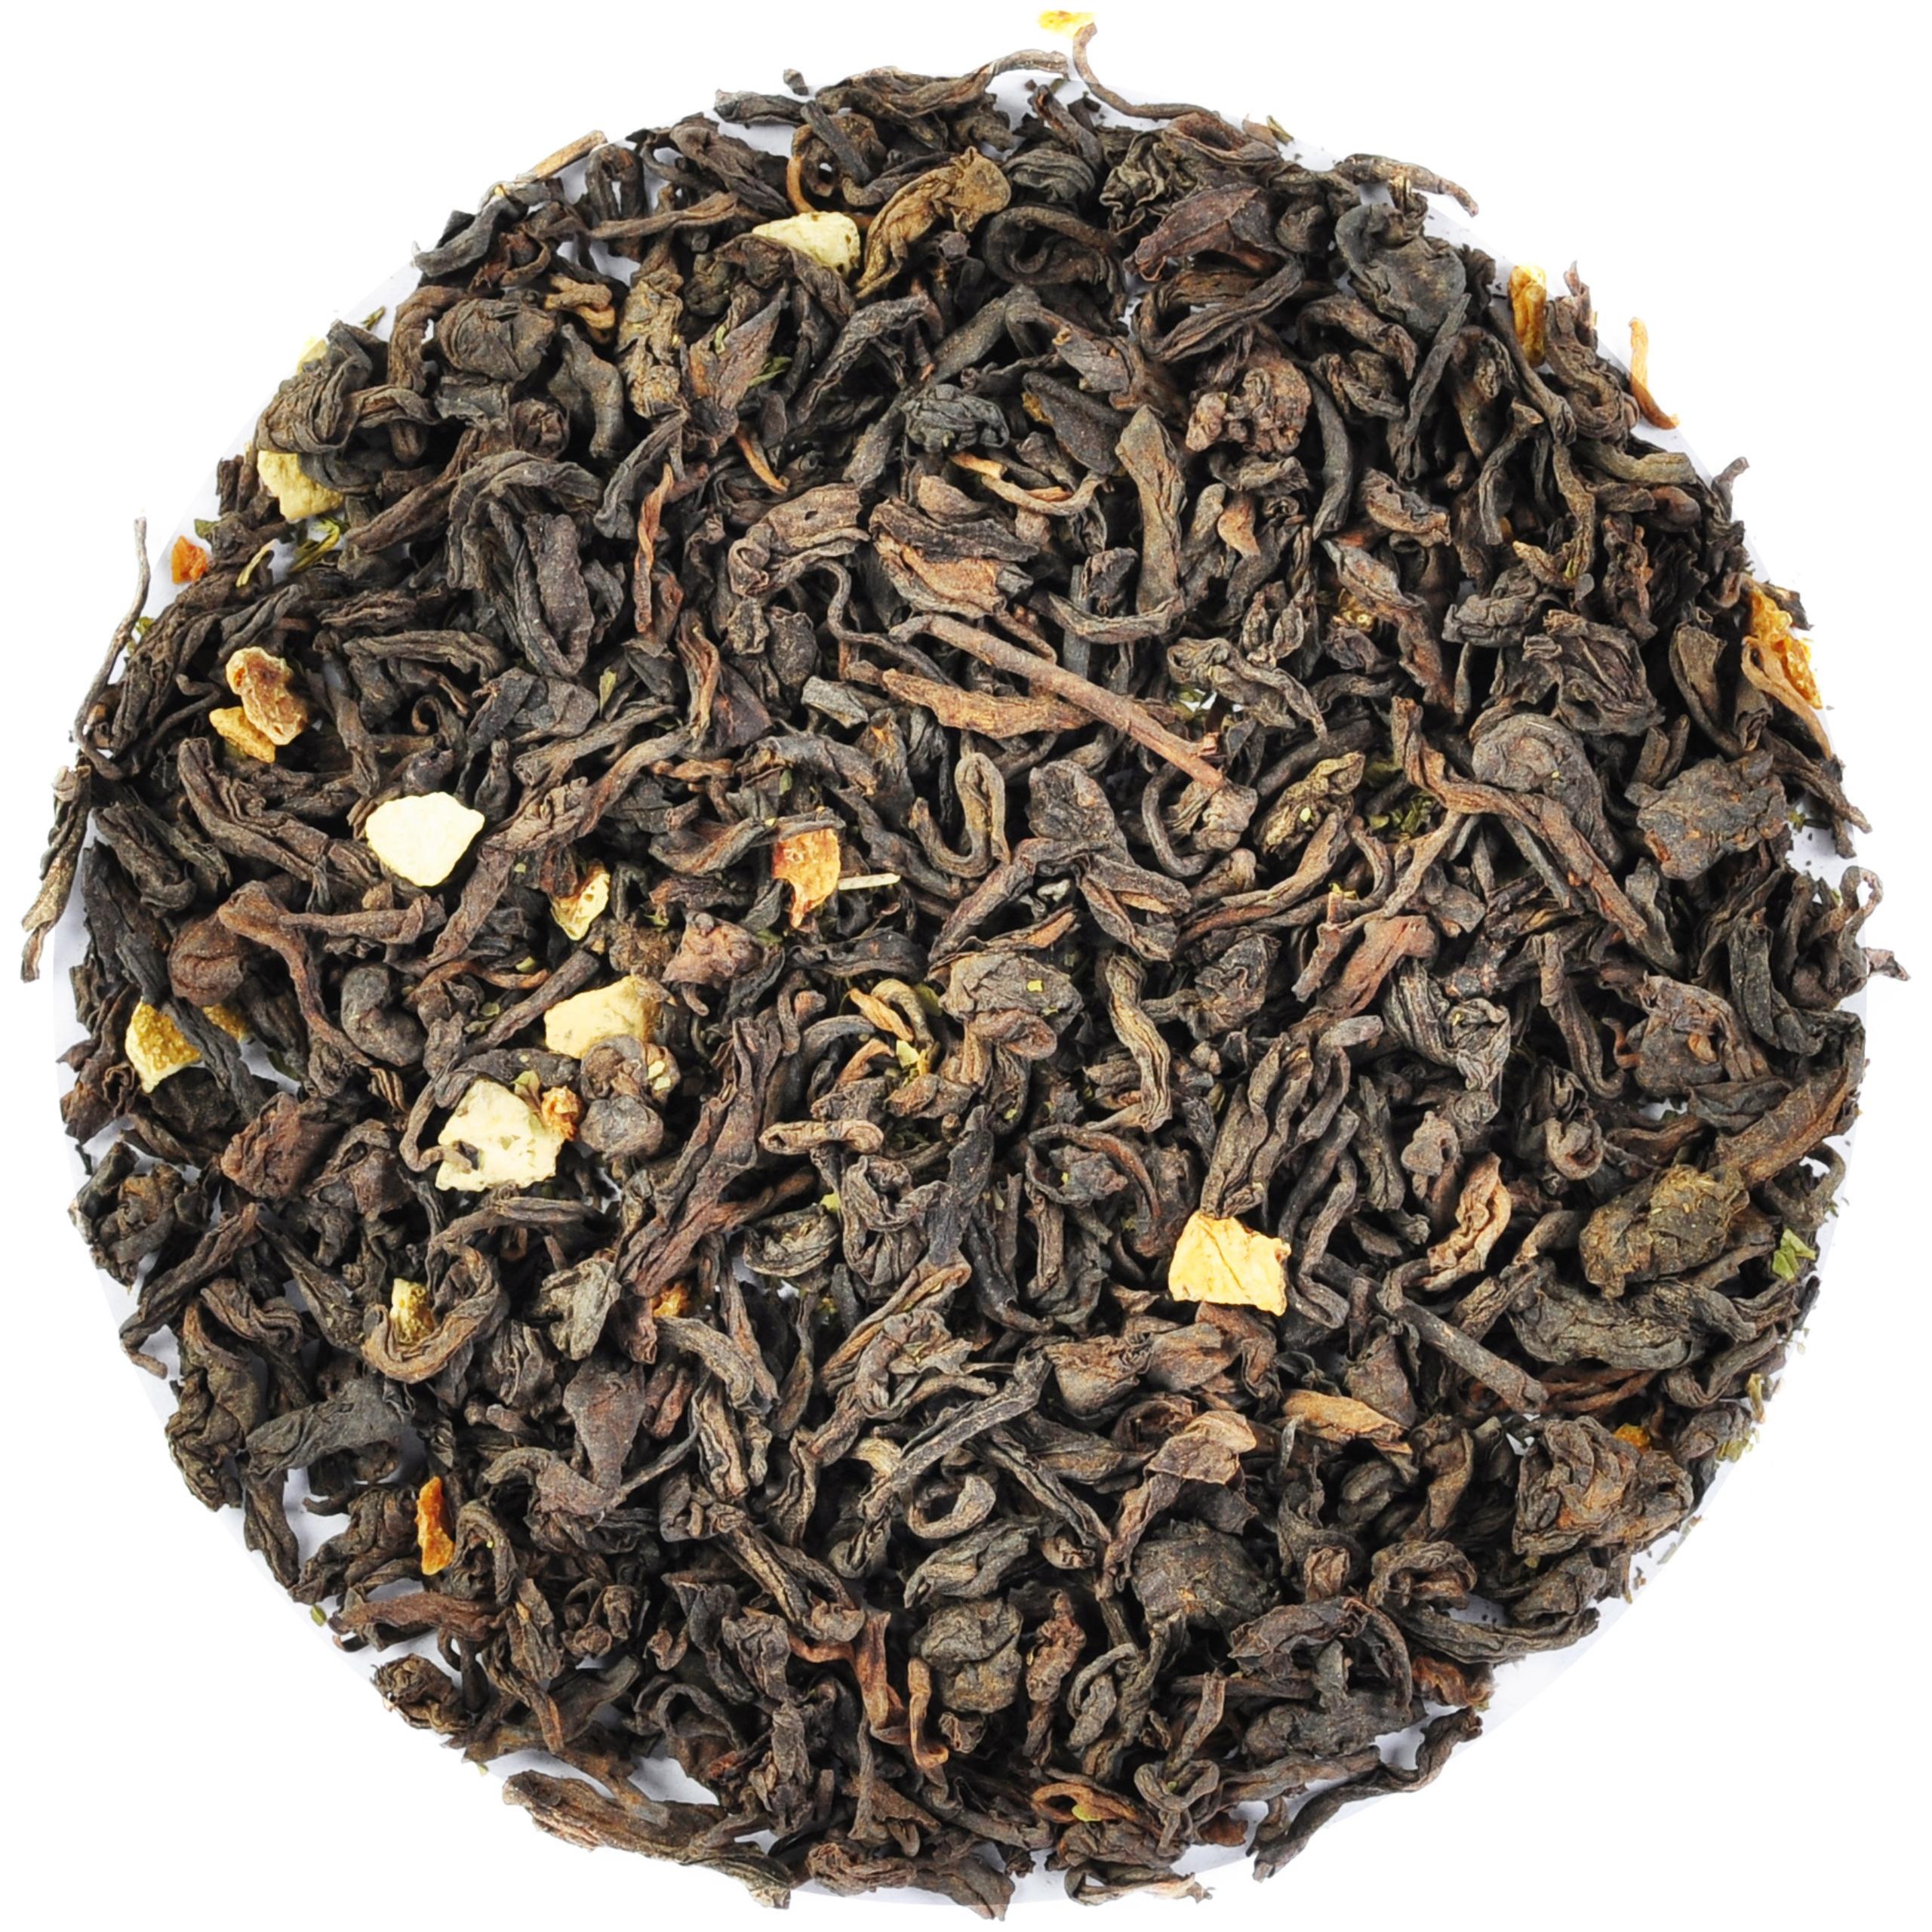 PU ERH FRESH Herbata Czerwona - Pu Erh 50g PYSZNA